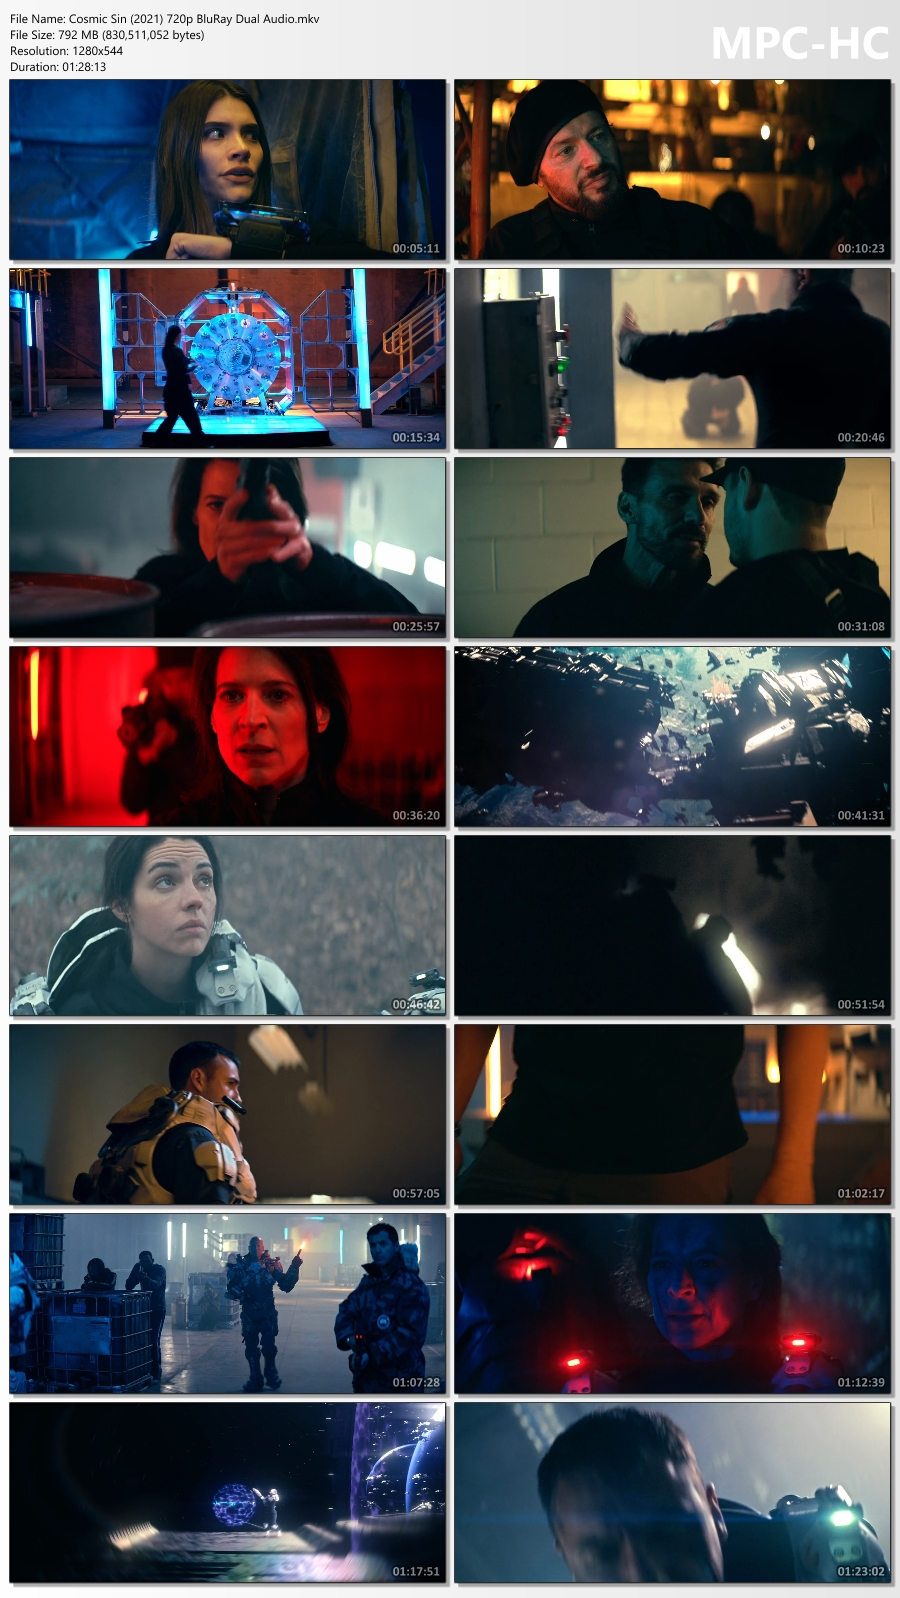 Cosmic-Sin-2021-720p-BluRay-Dual-Audio.mkv_thumbs.jpg